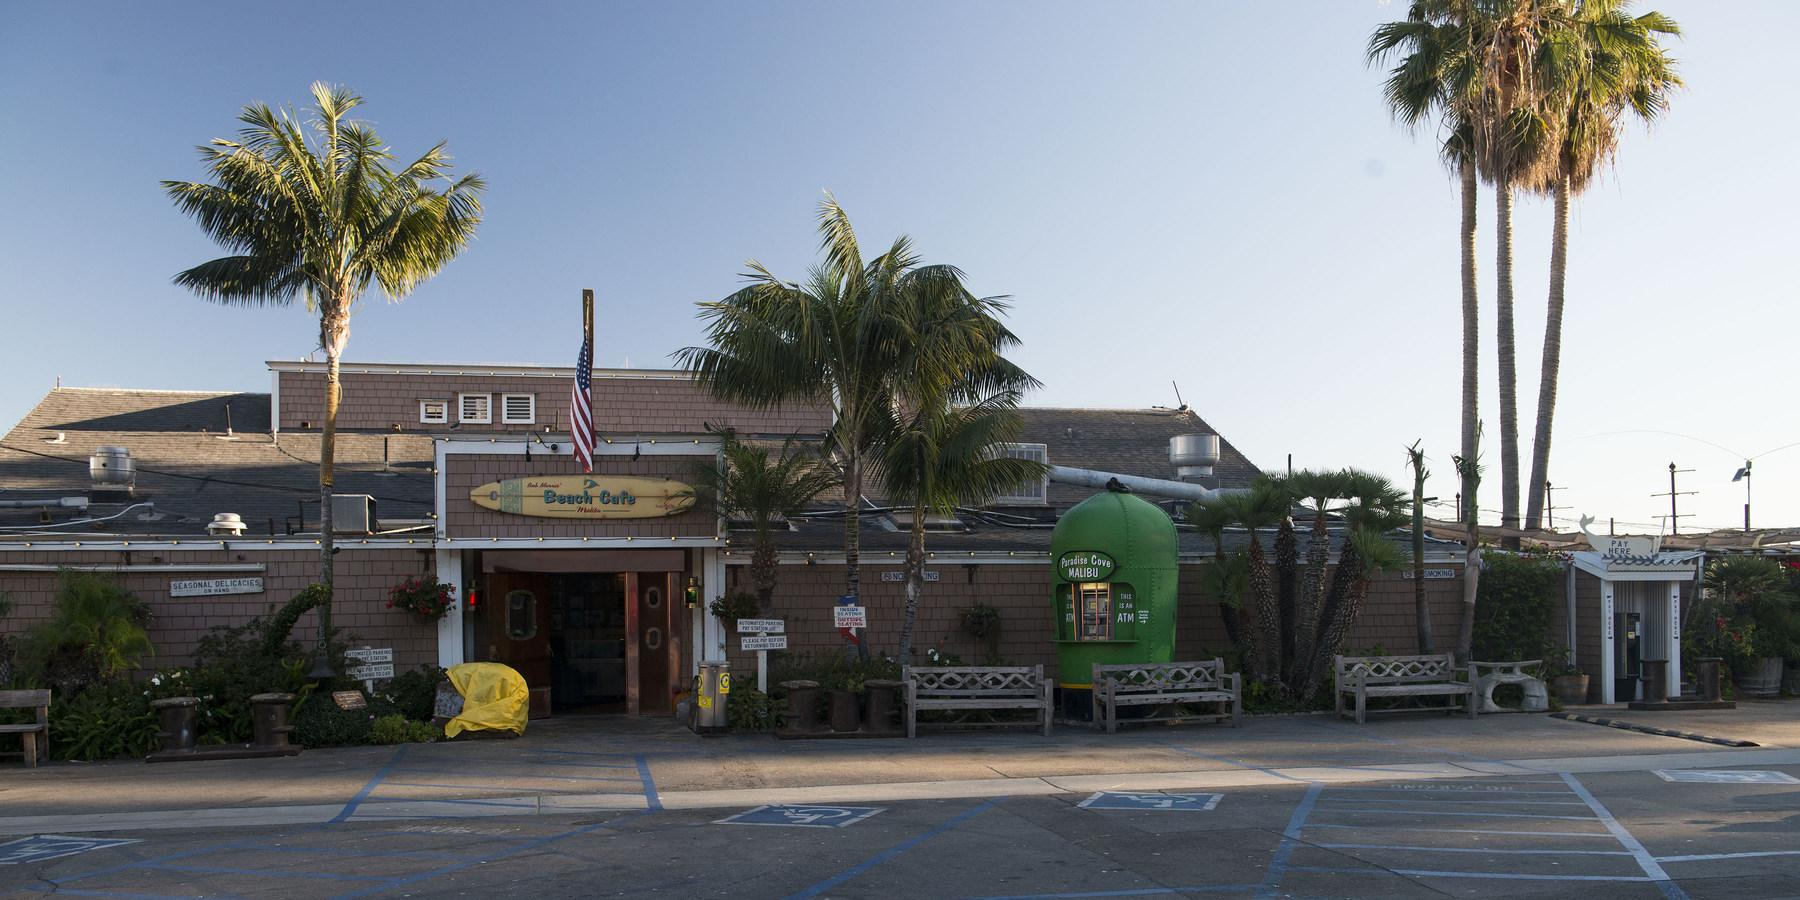 Paradise Cove Beach Cafe Parking